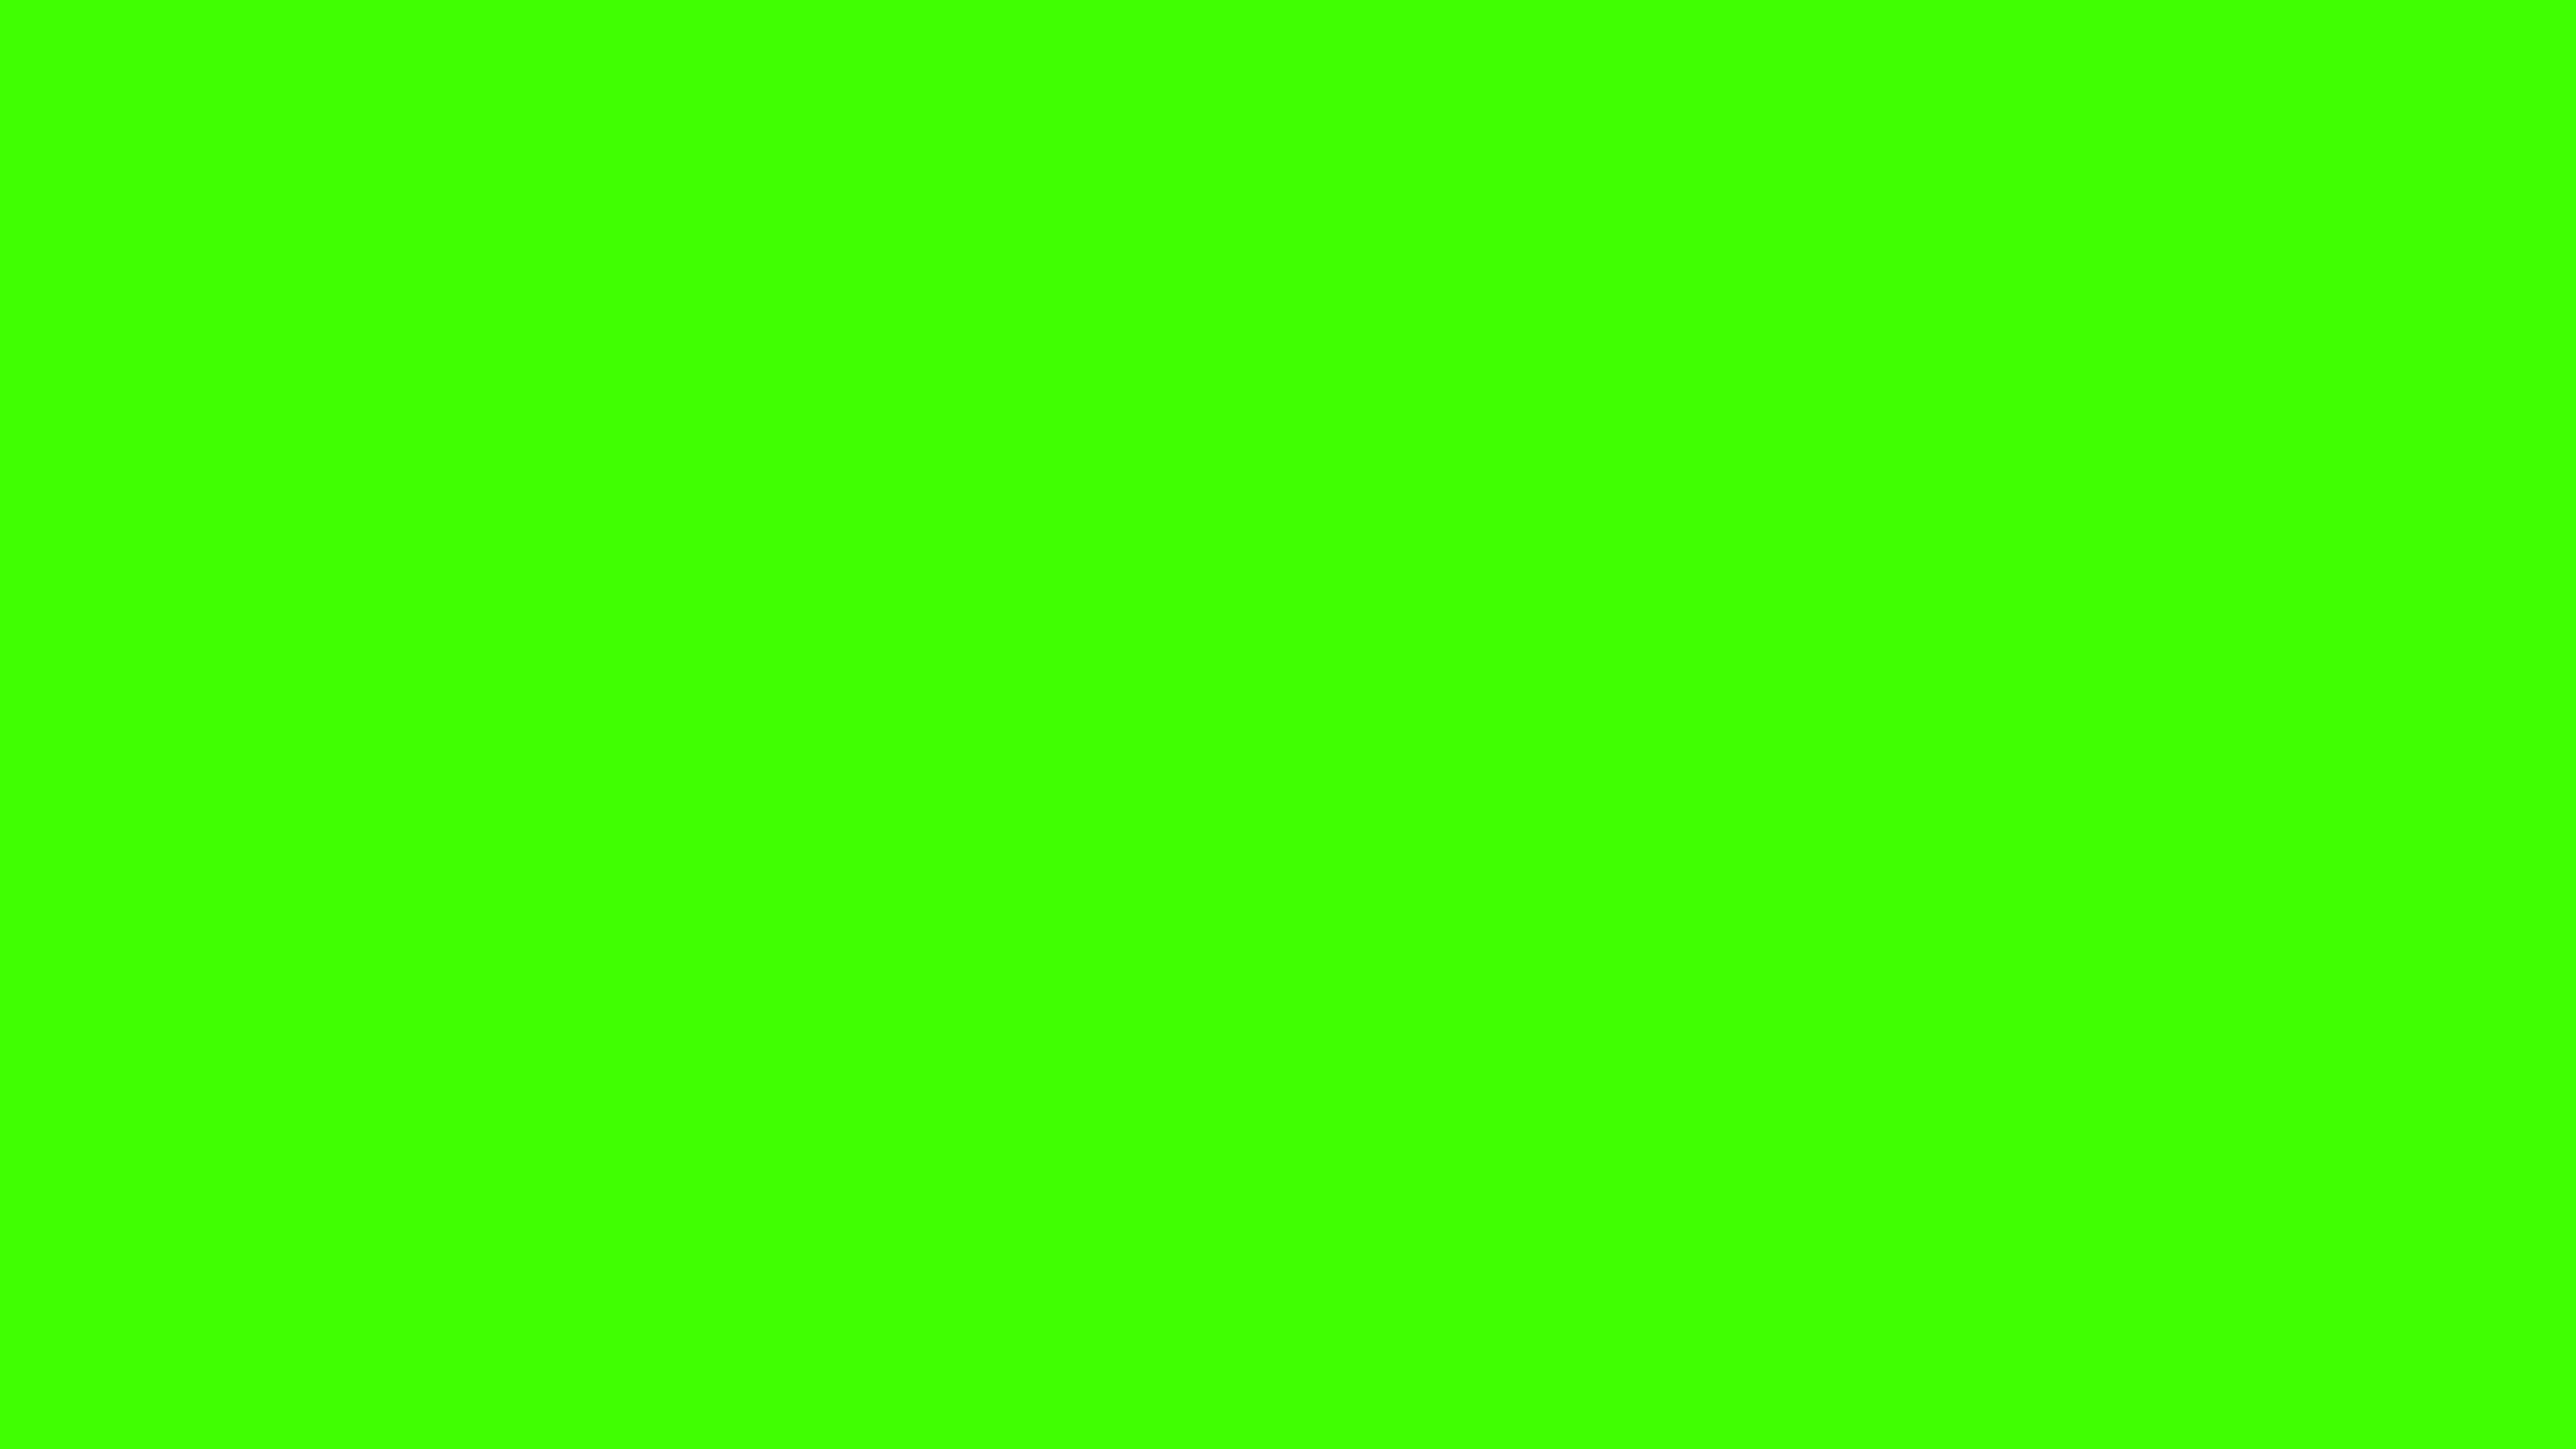 5120x2880 Harlequin Solid Color Background